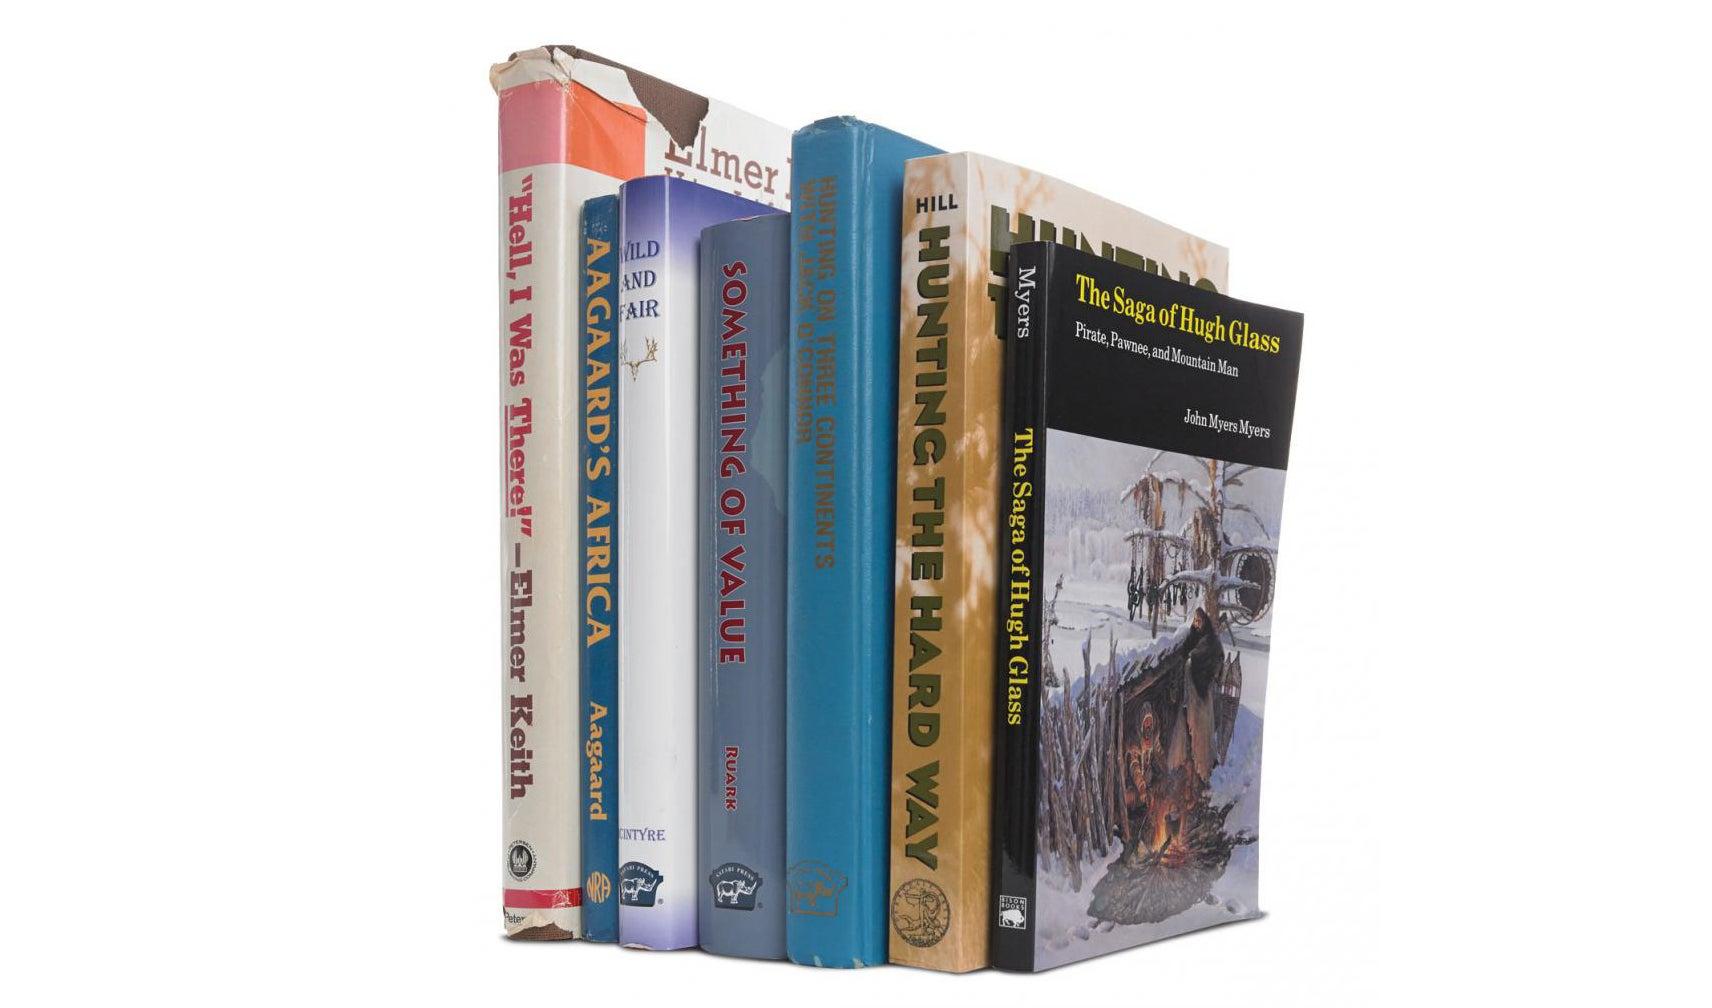 hunting books,